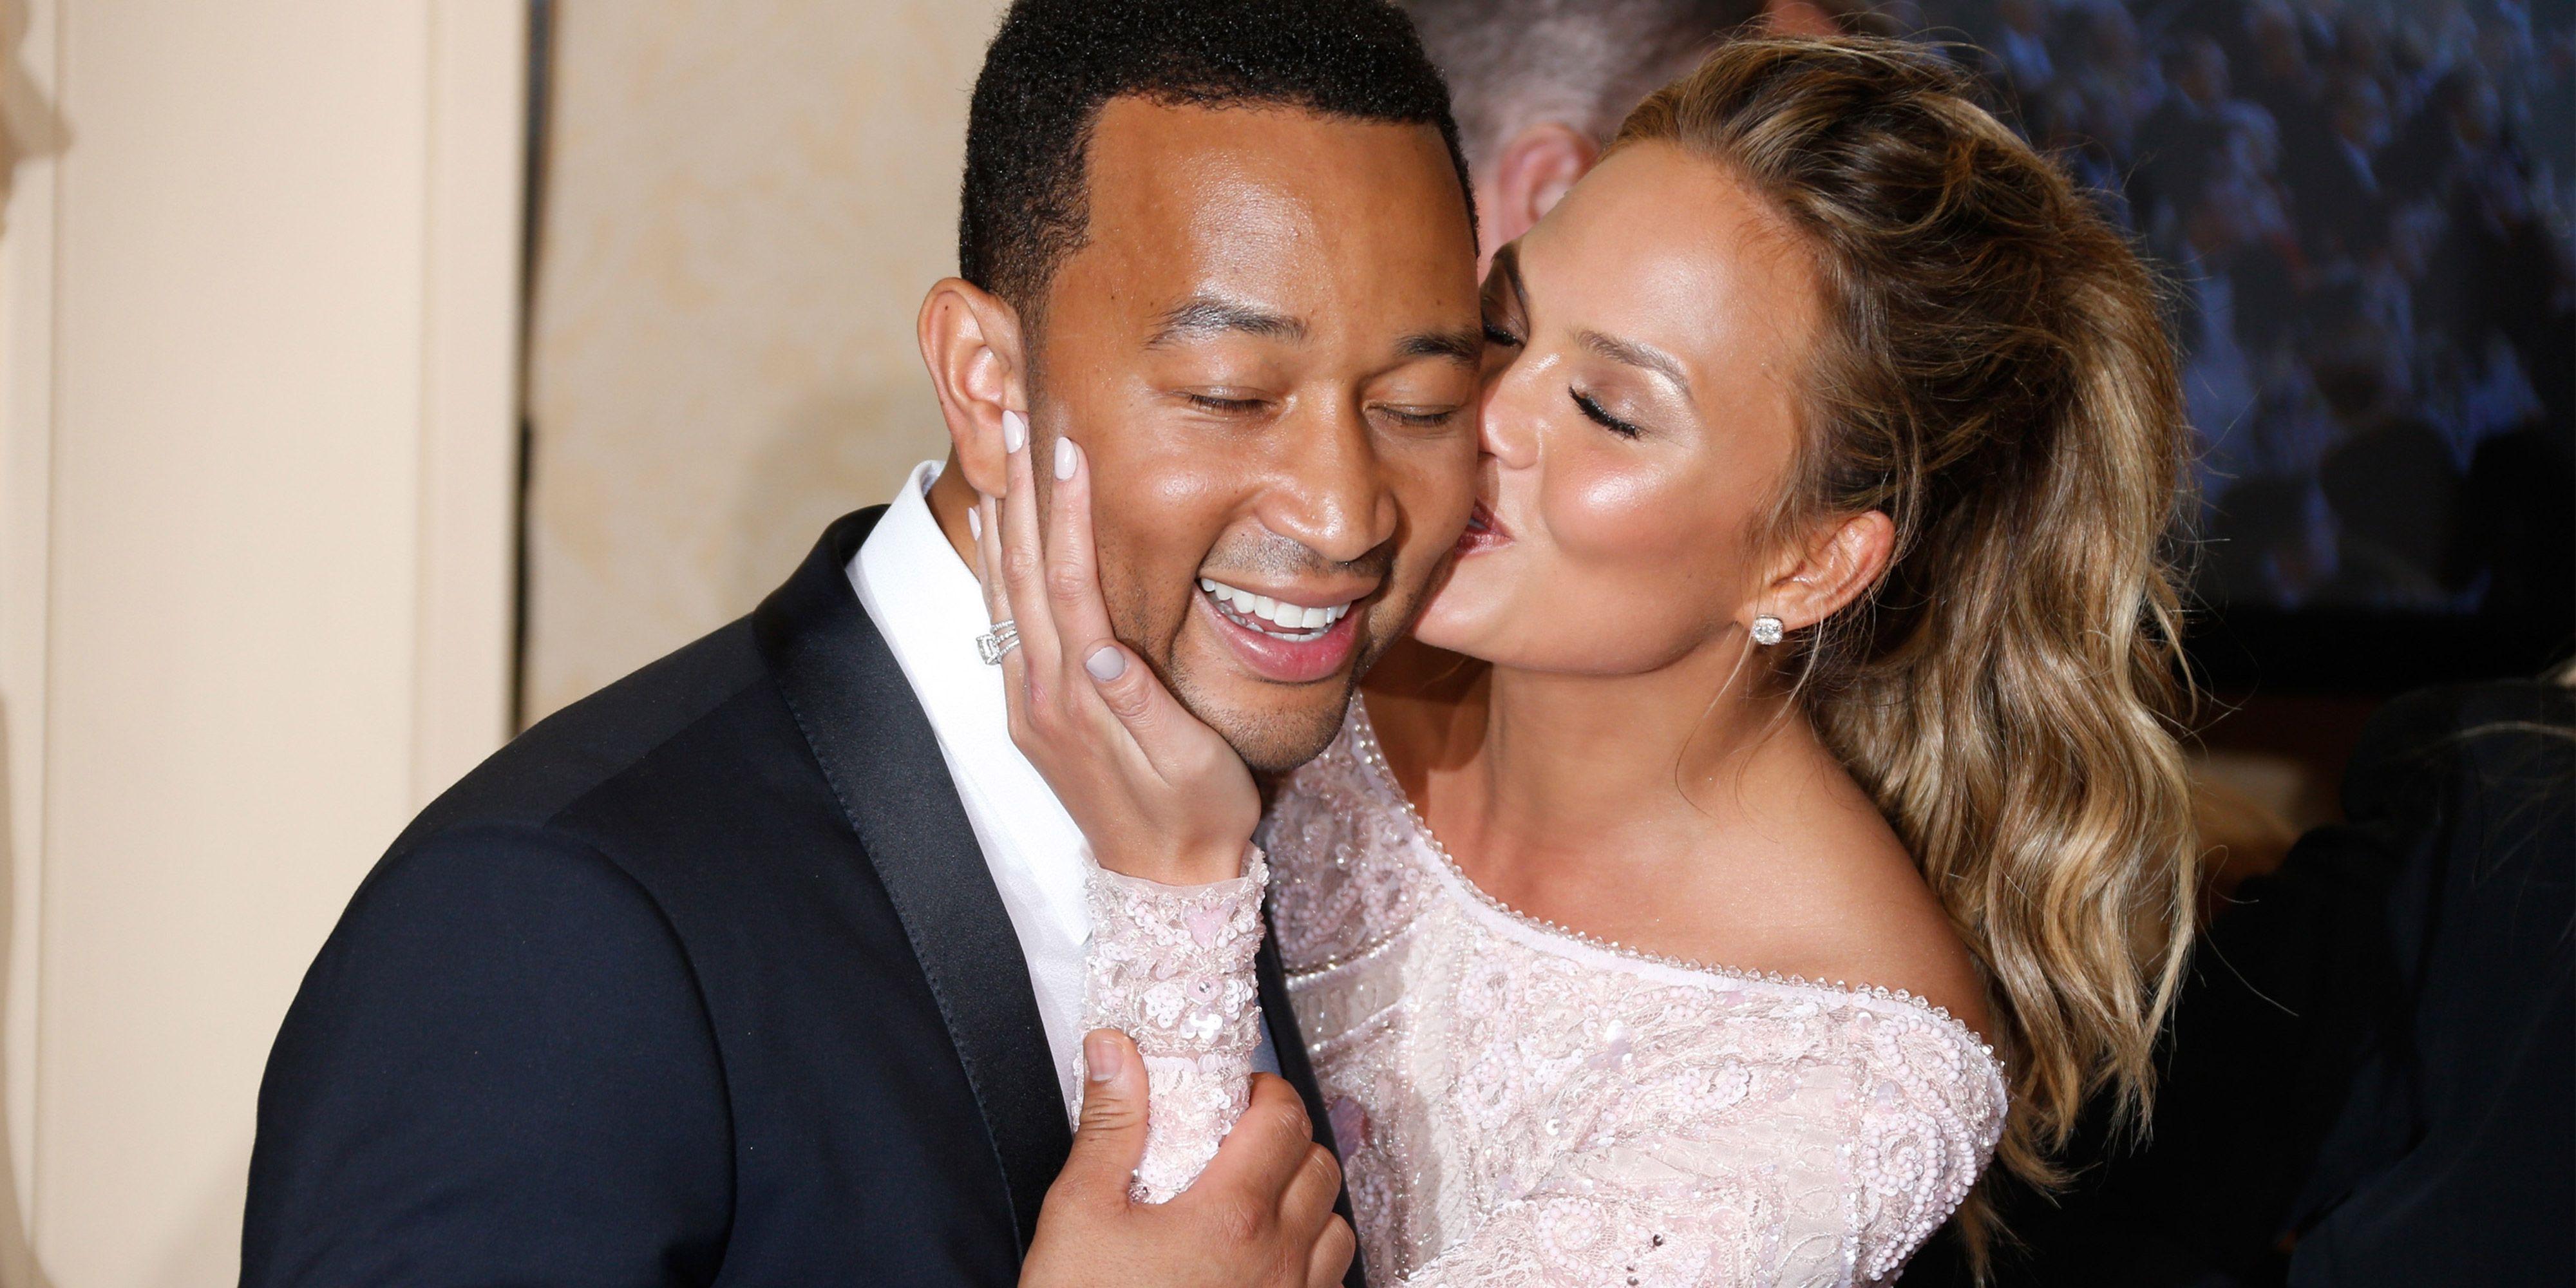 d7a16916a71 John Legend reveals the secret to his happy relationship with Chrissy Teigen